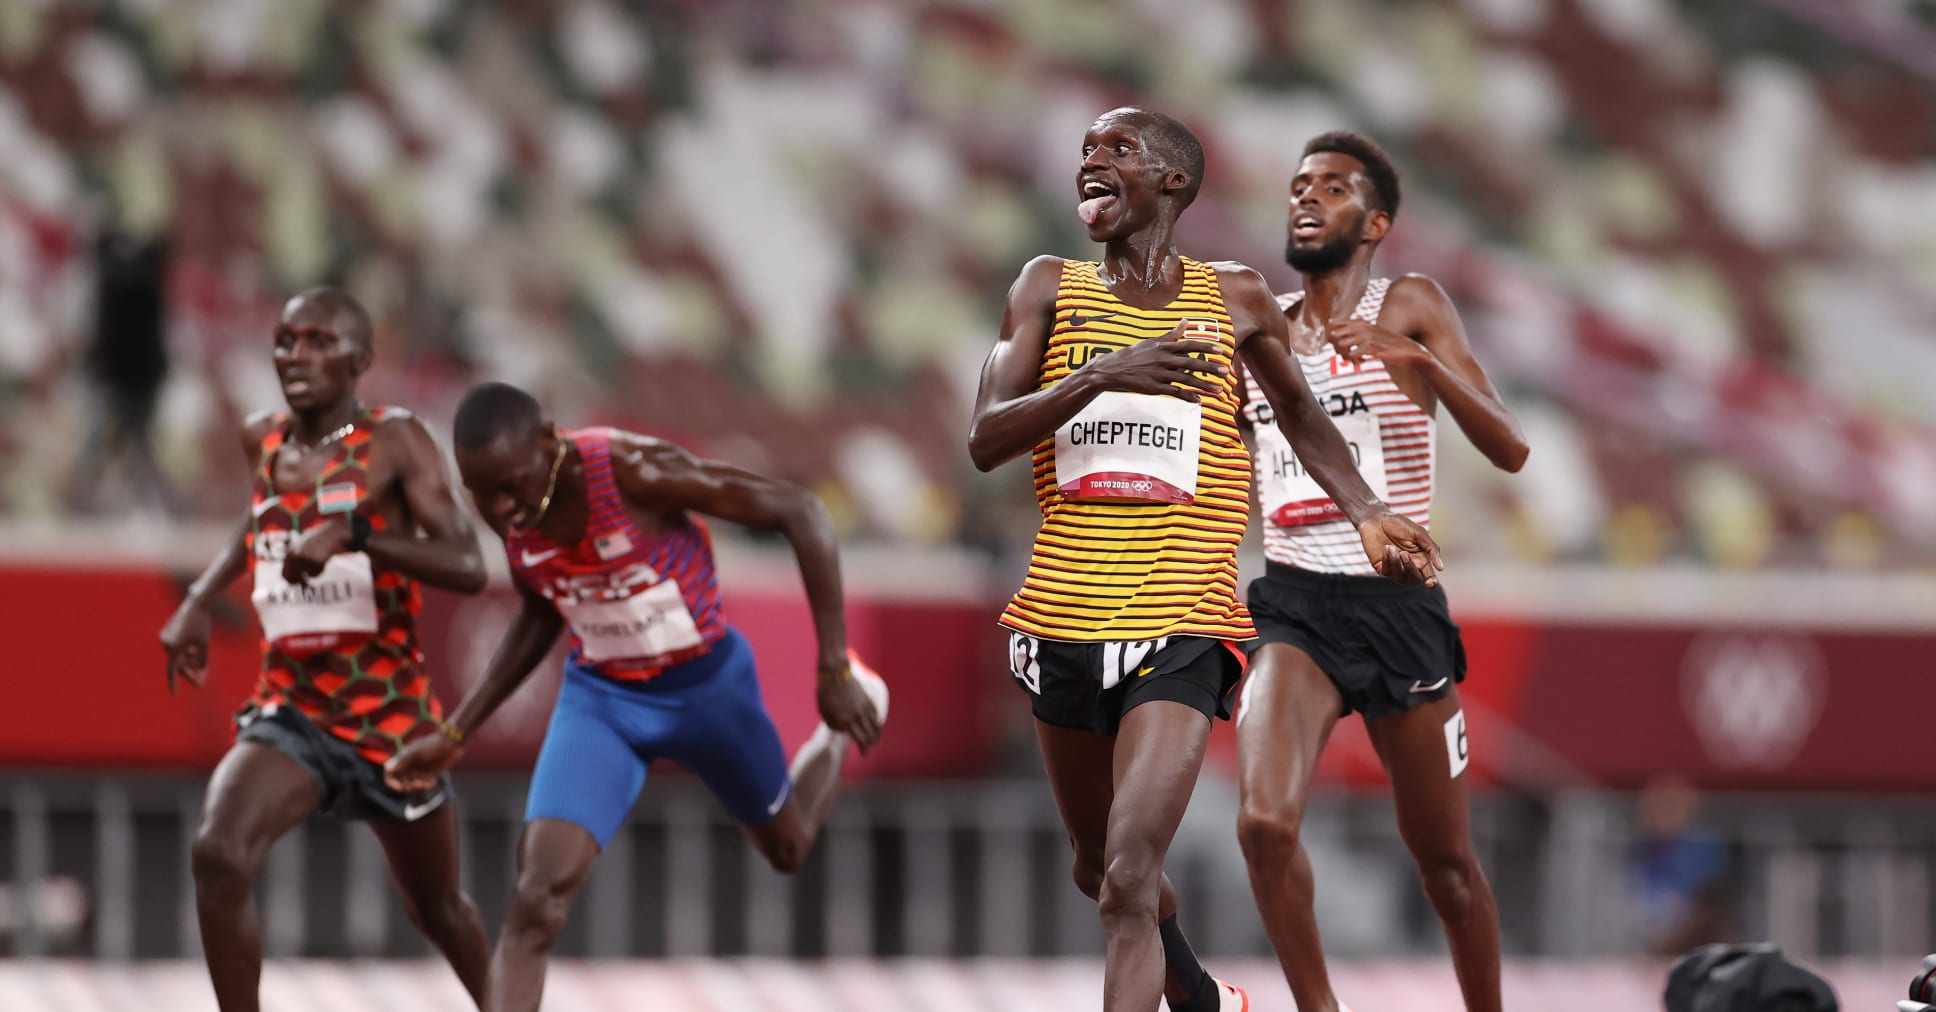 Kenya keeps dominating the world in track athletics